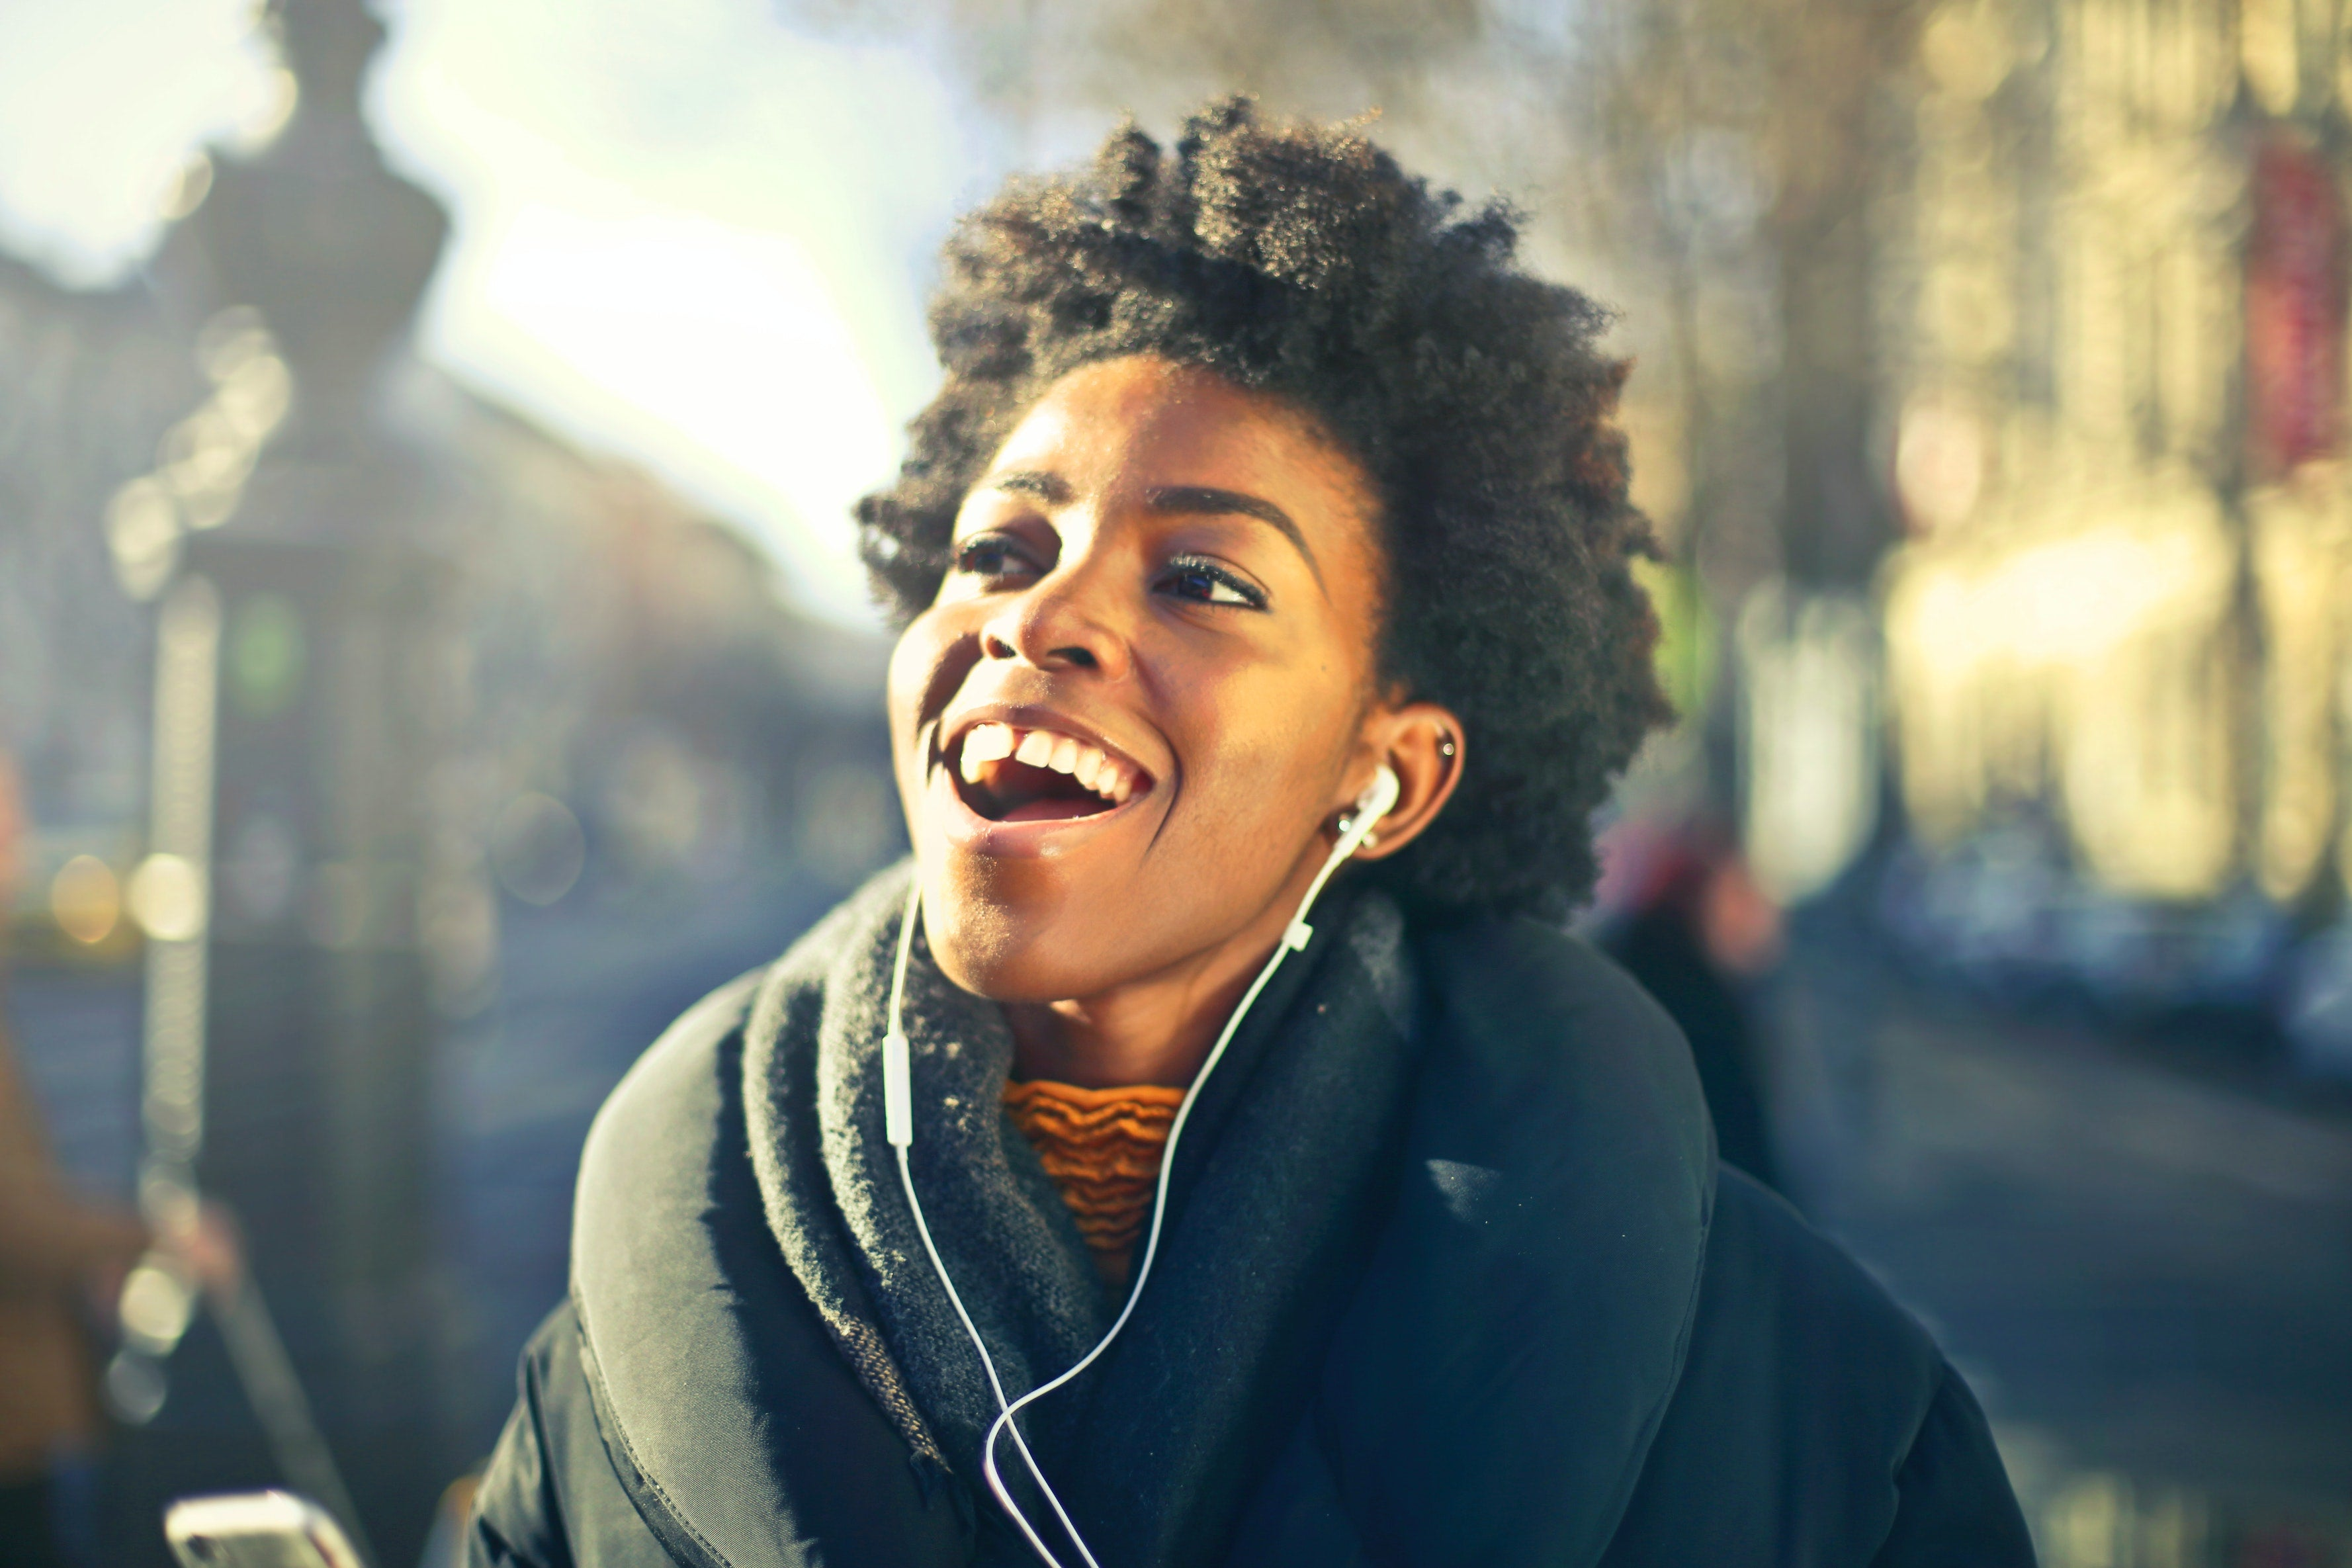 A woman joyfully listening to music on a walk